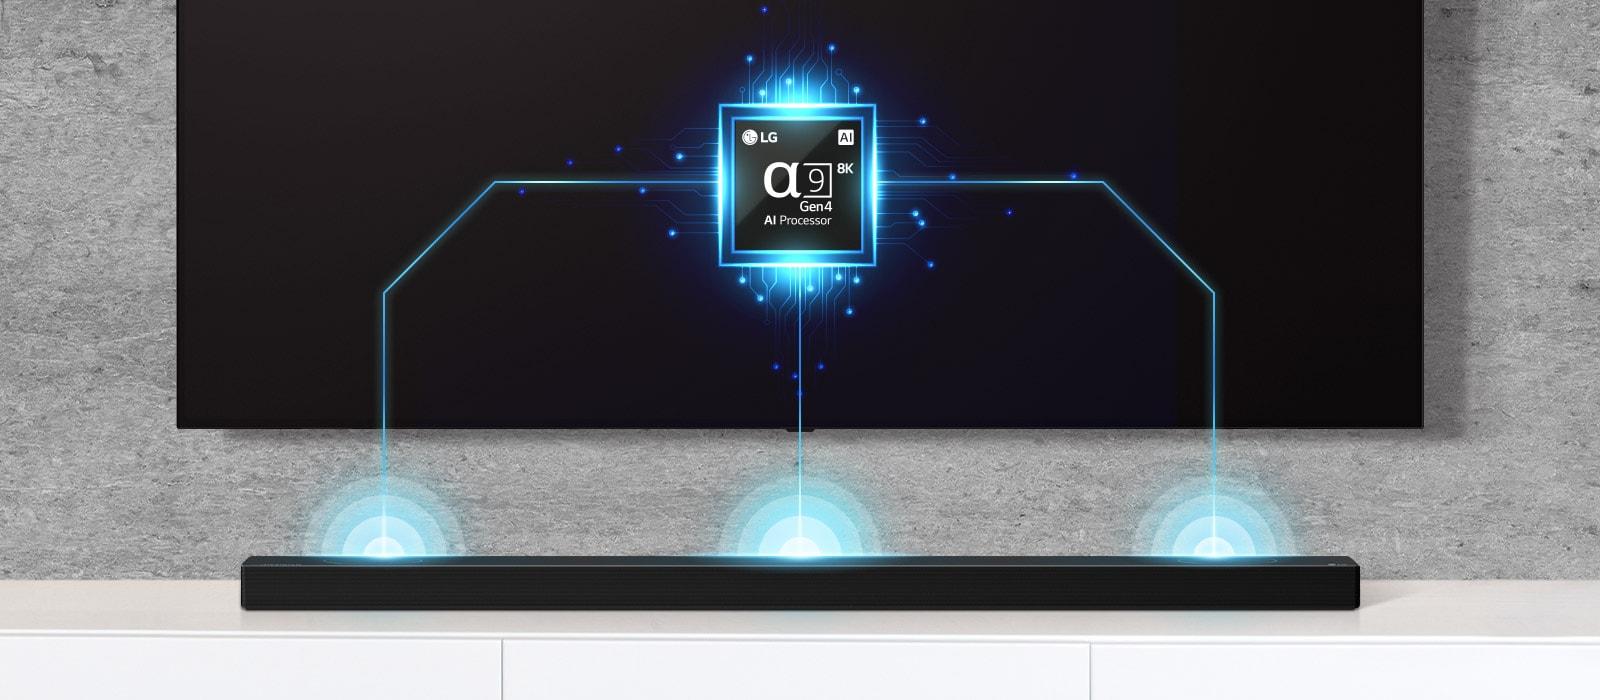 https://www.lg.com/sg/images/home-audio/md07528051/feature/SP9YA_Home_audio-04-AI-Processor-Desktop.jpg